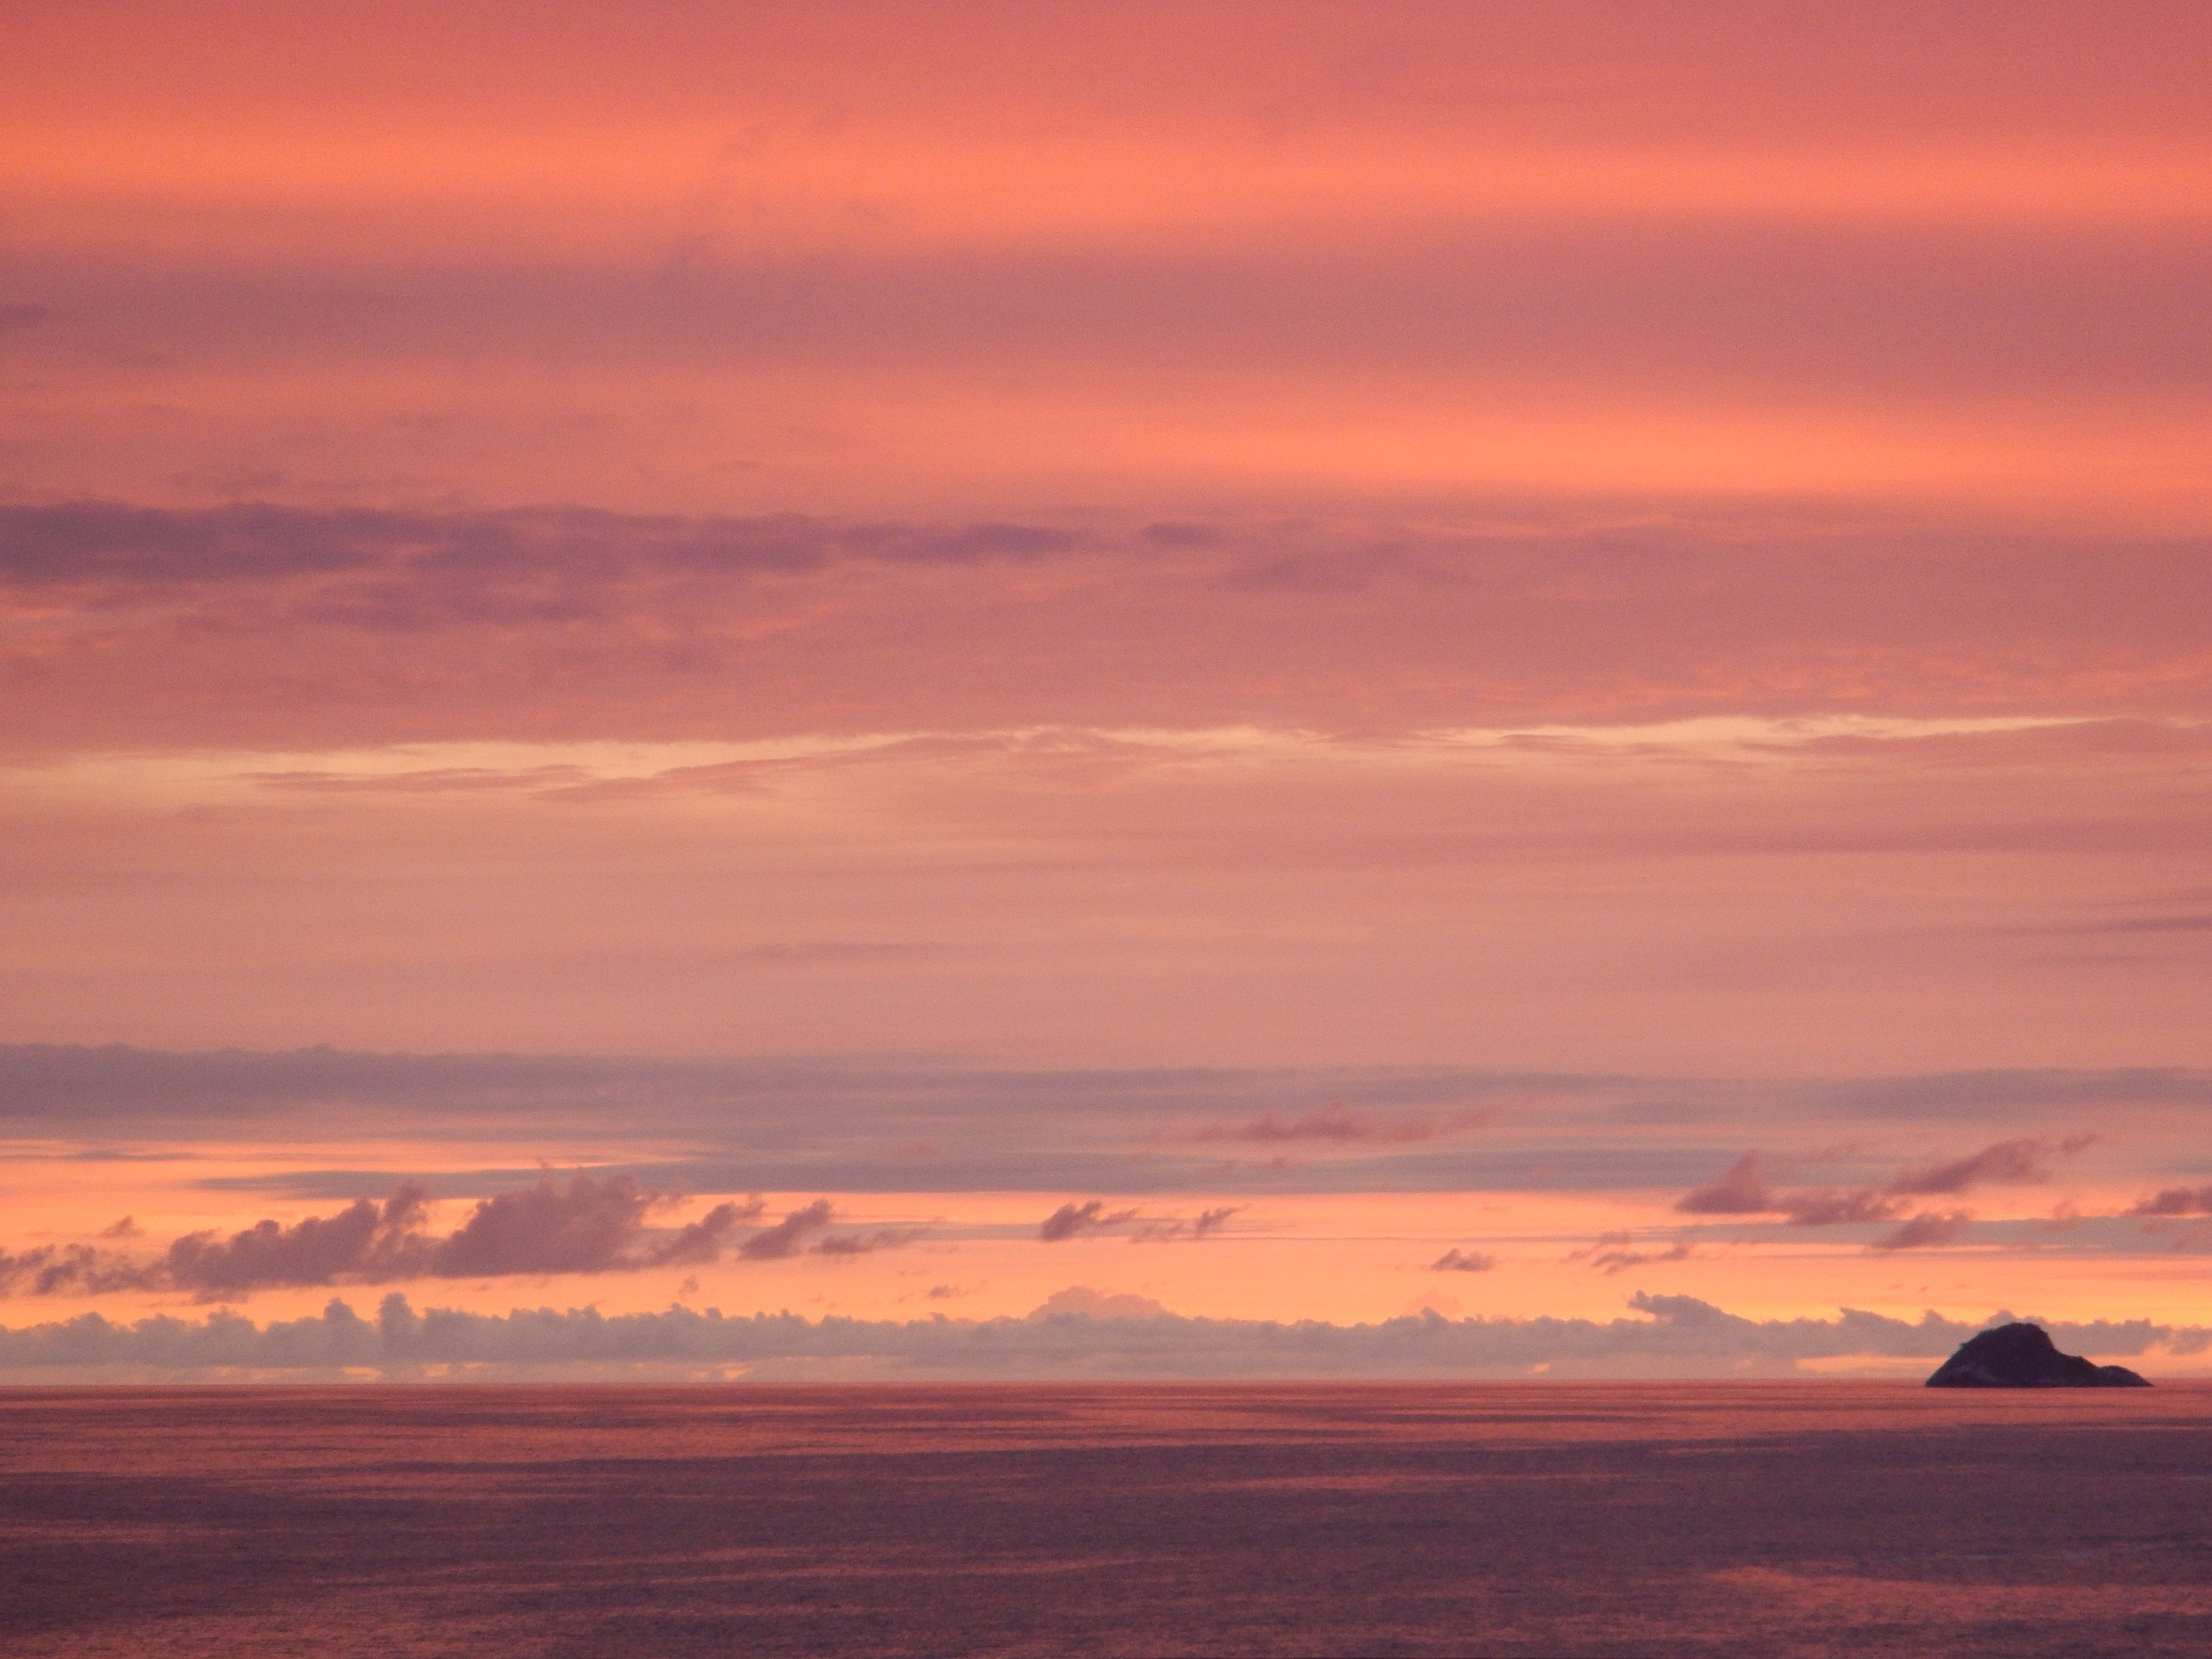 Sunset on Leblon, Rio de Janeiro